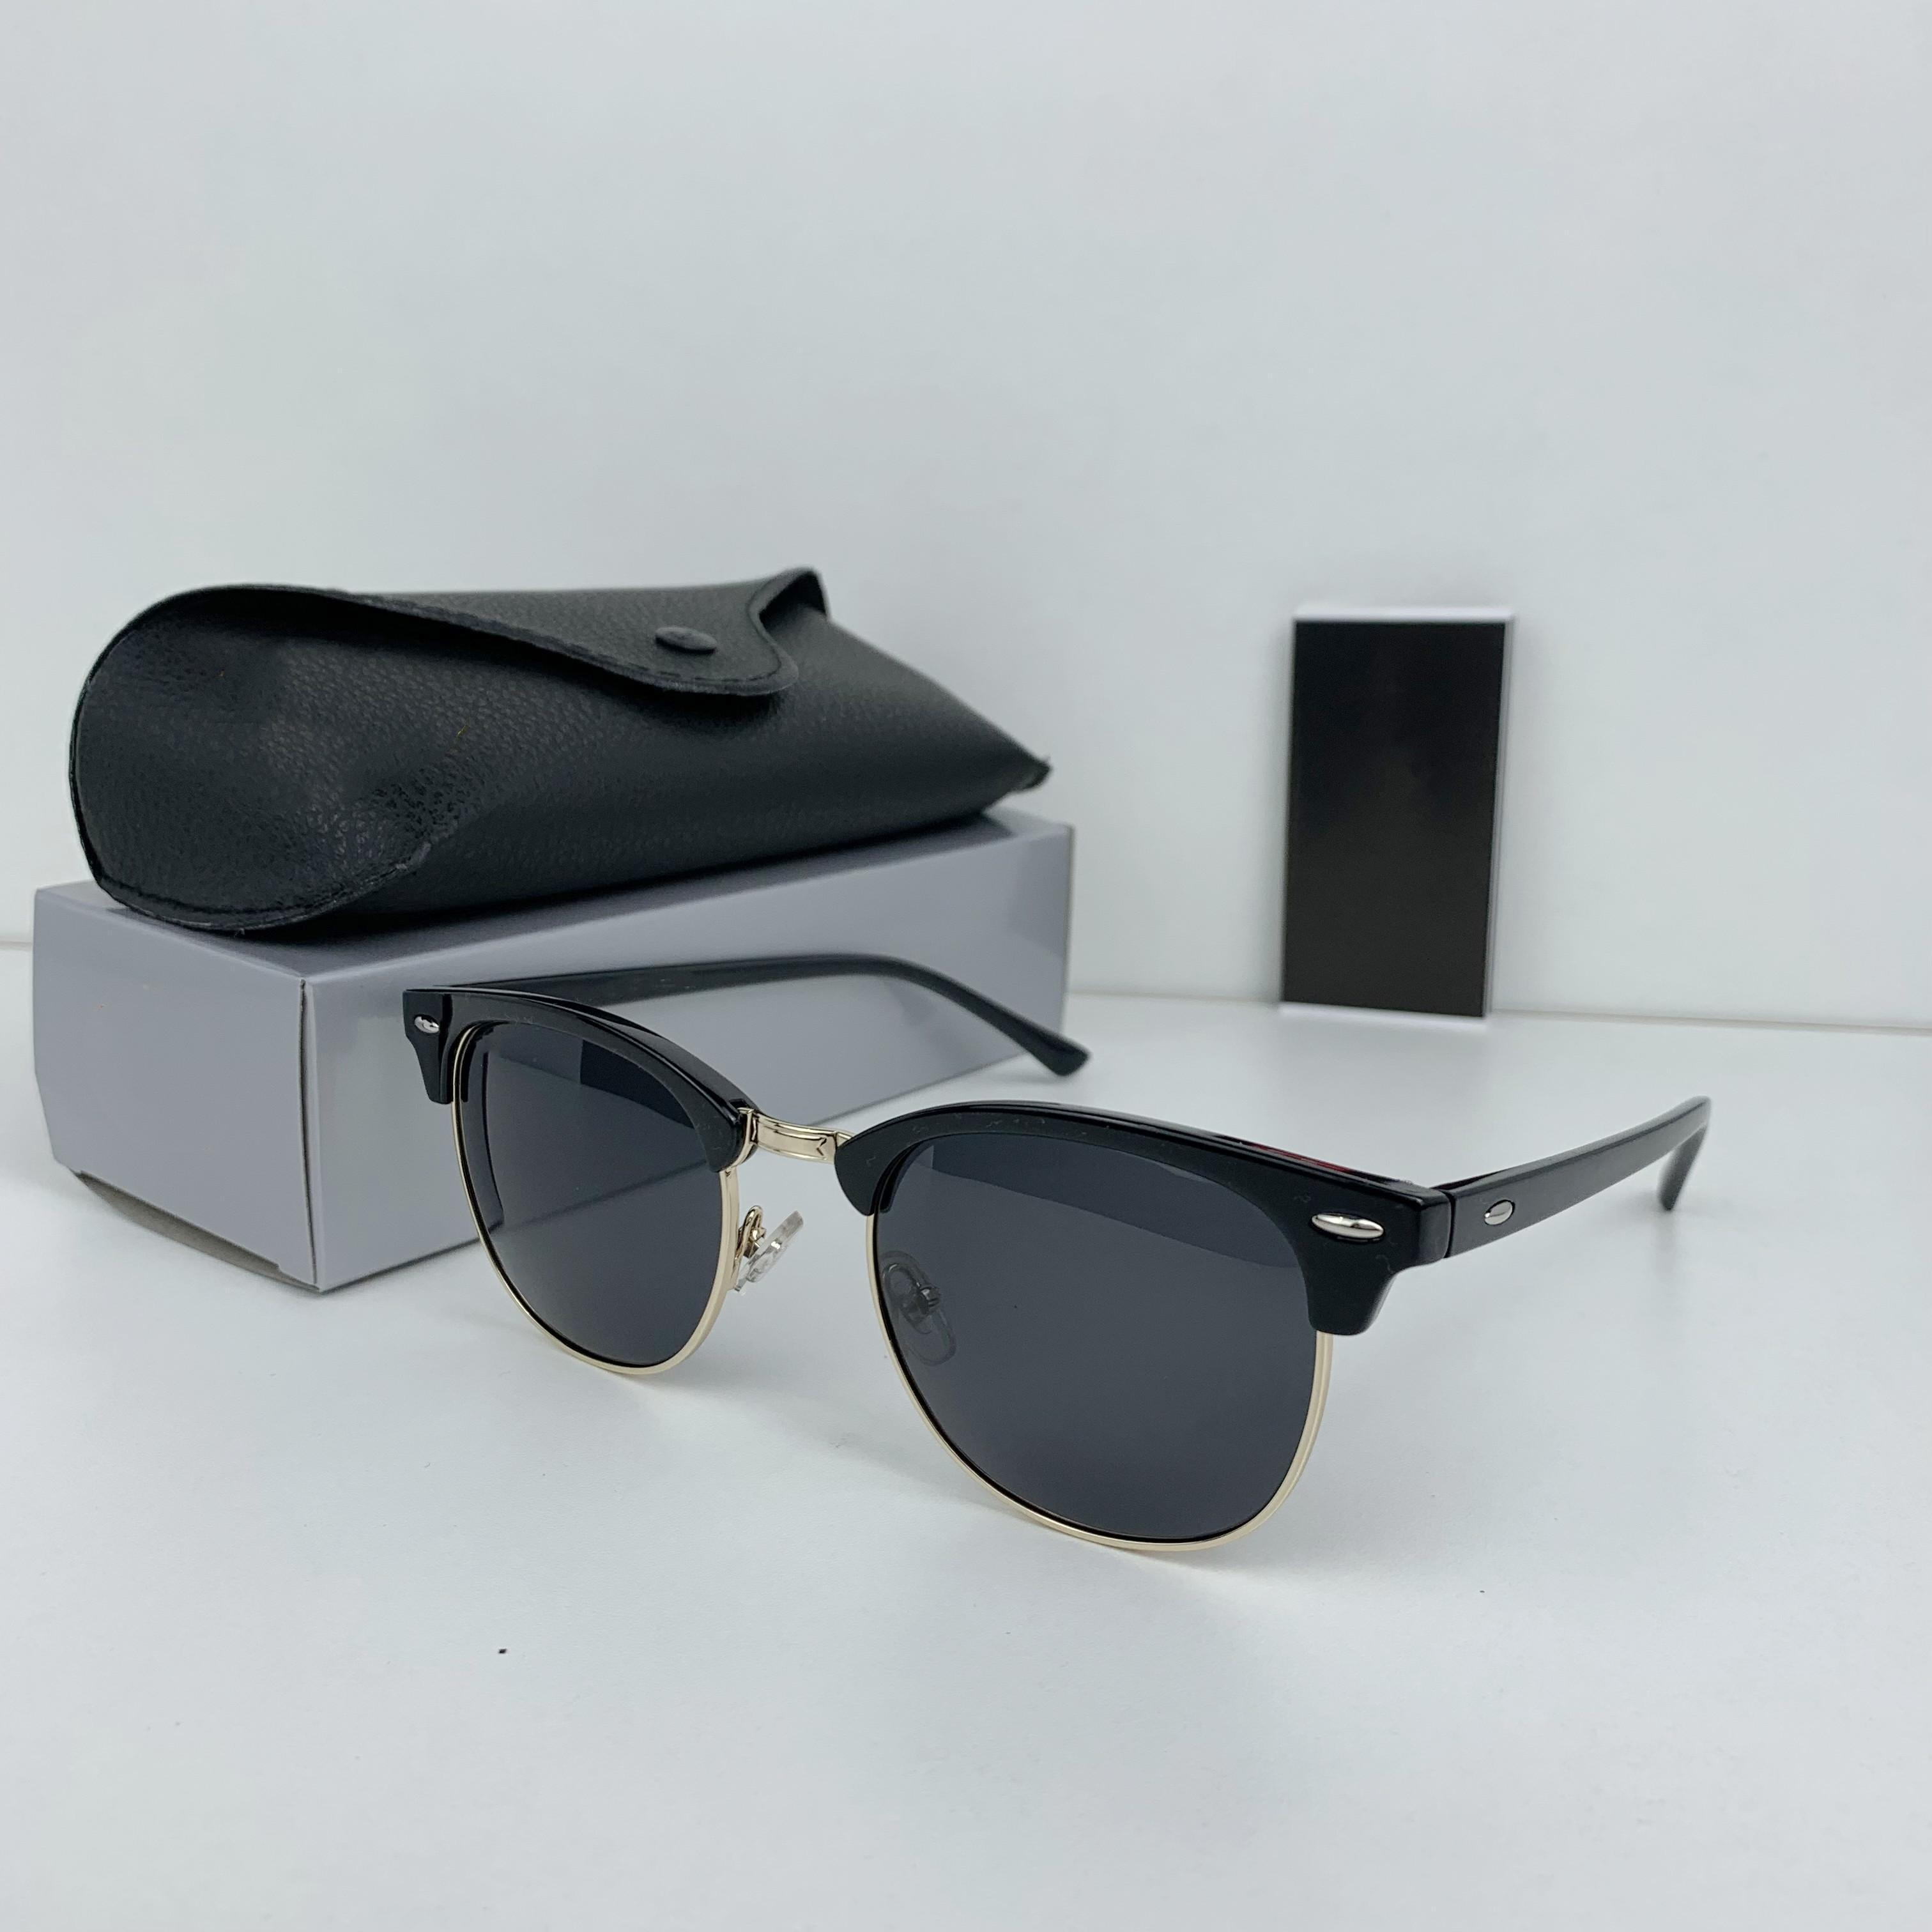 Luxury New Brand Polarized Designer Sunglasses Mens Women Pilot Sunglasses UV400 Eyewear Glasses Metal Frame Polaroid Lens Sun Glasses With Box